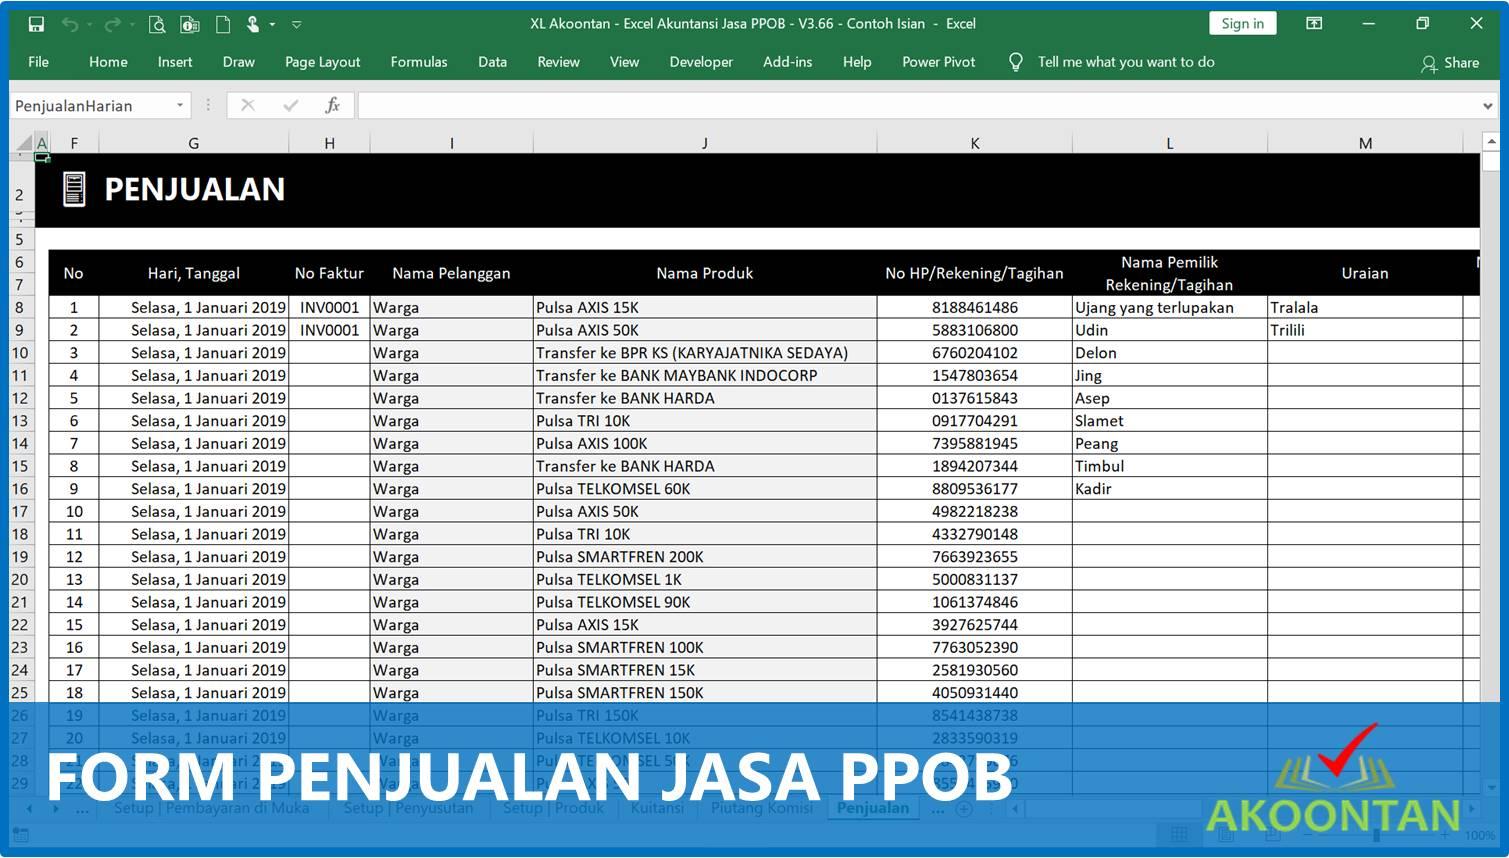 Akuntansi-ID - Form Penjualan Jasa PPOB